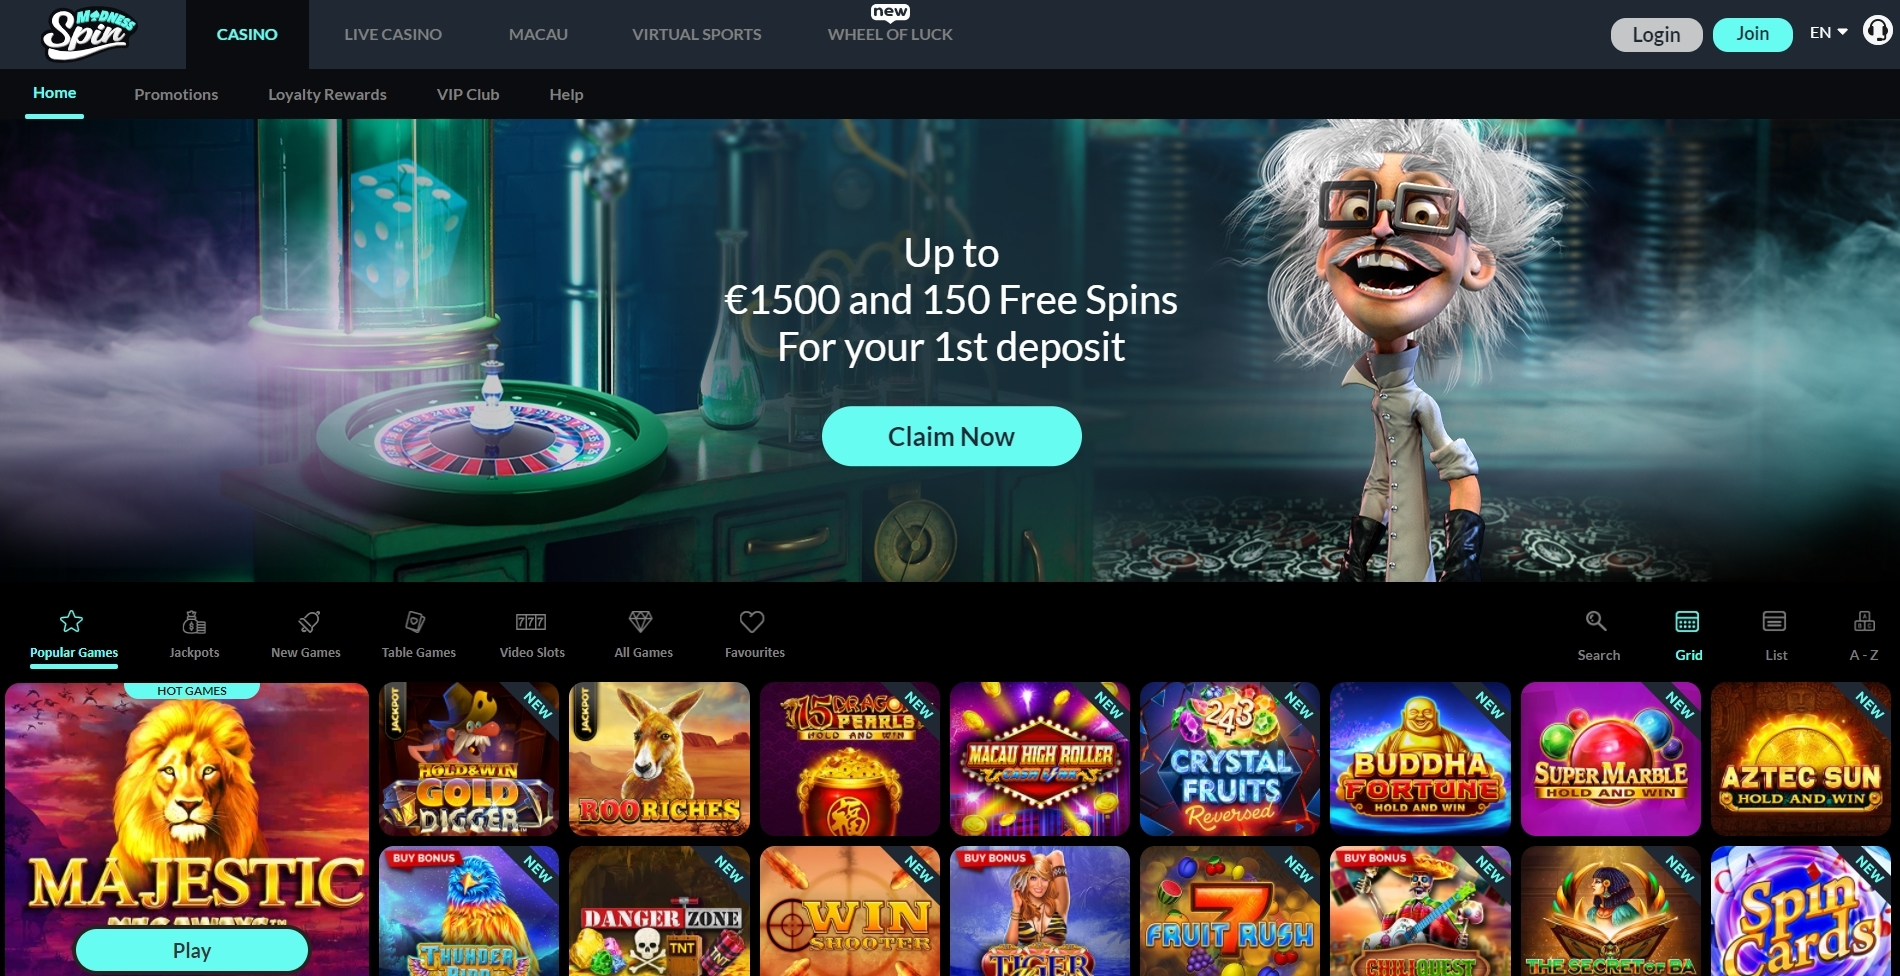 spin madness casino review and bonus